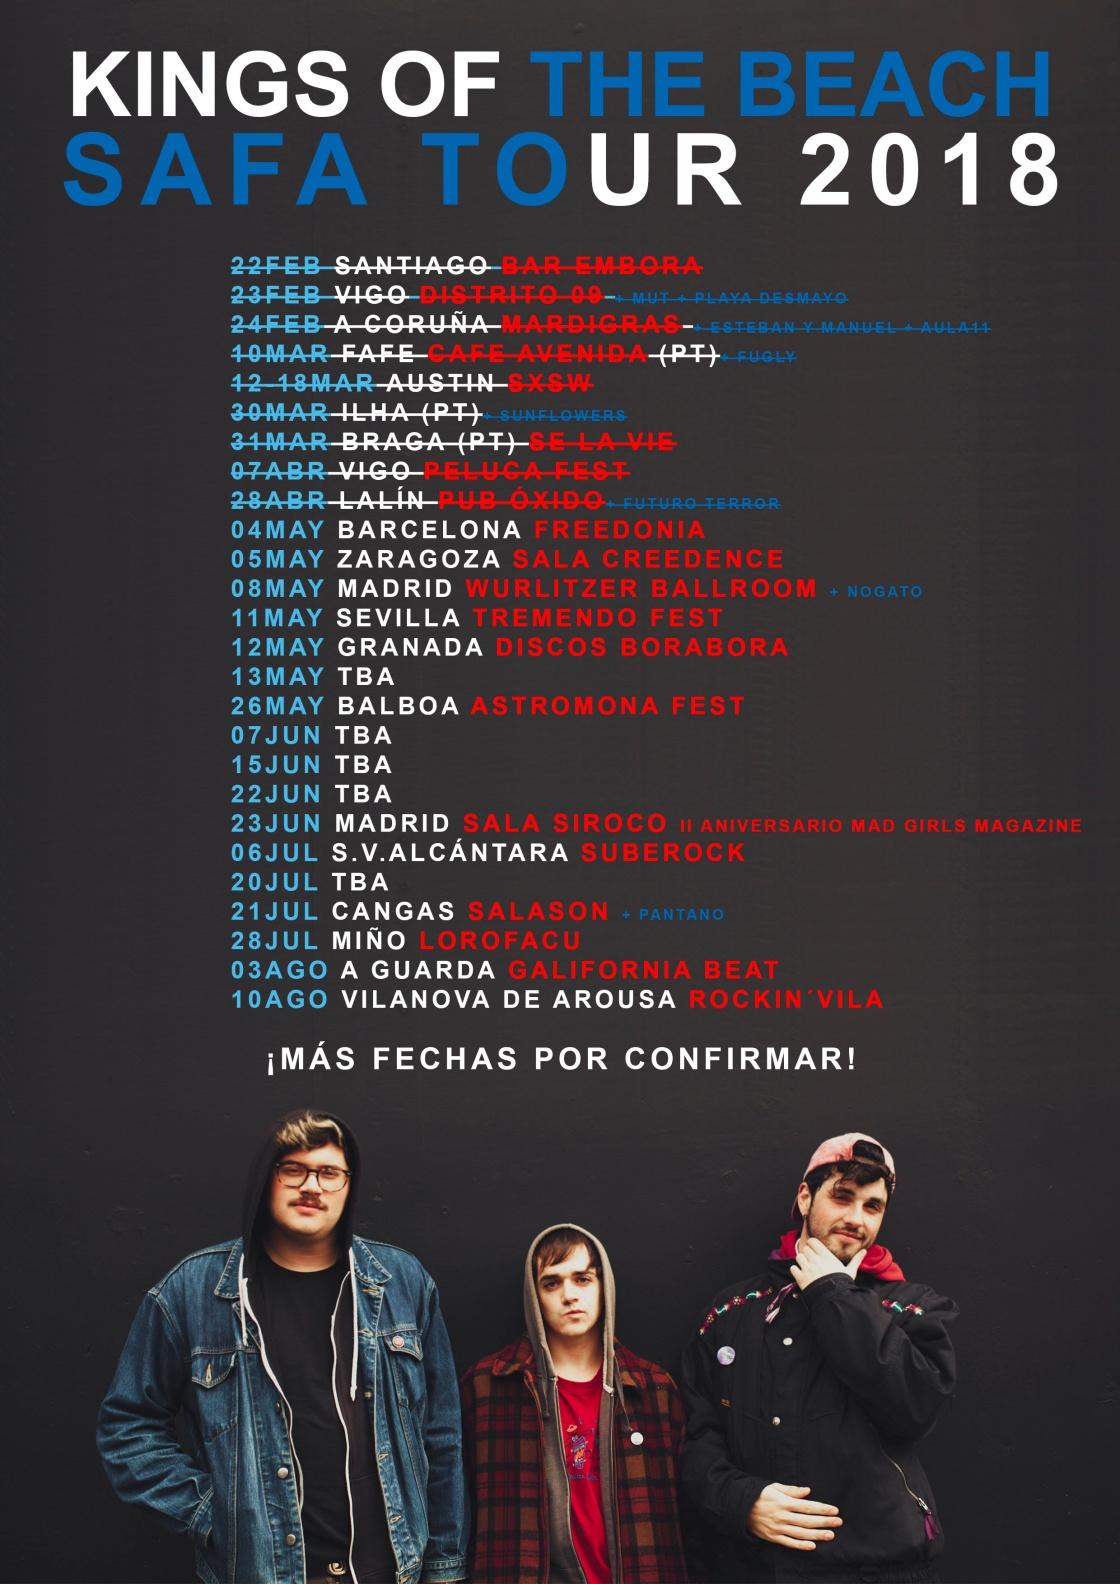 Kings Of The Beach y su gira 2018